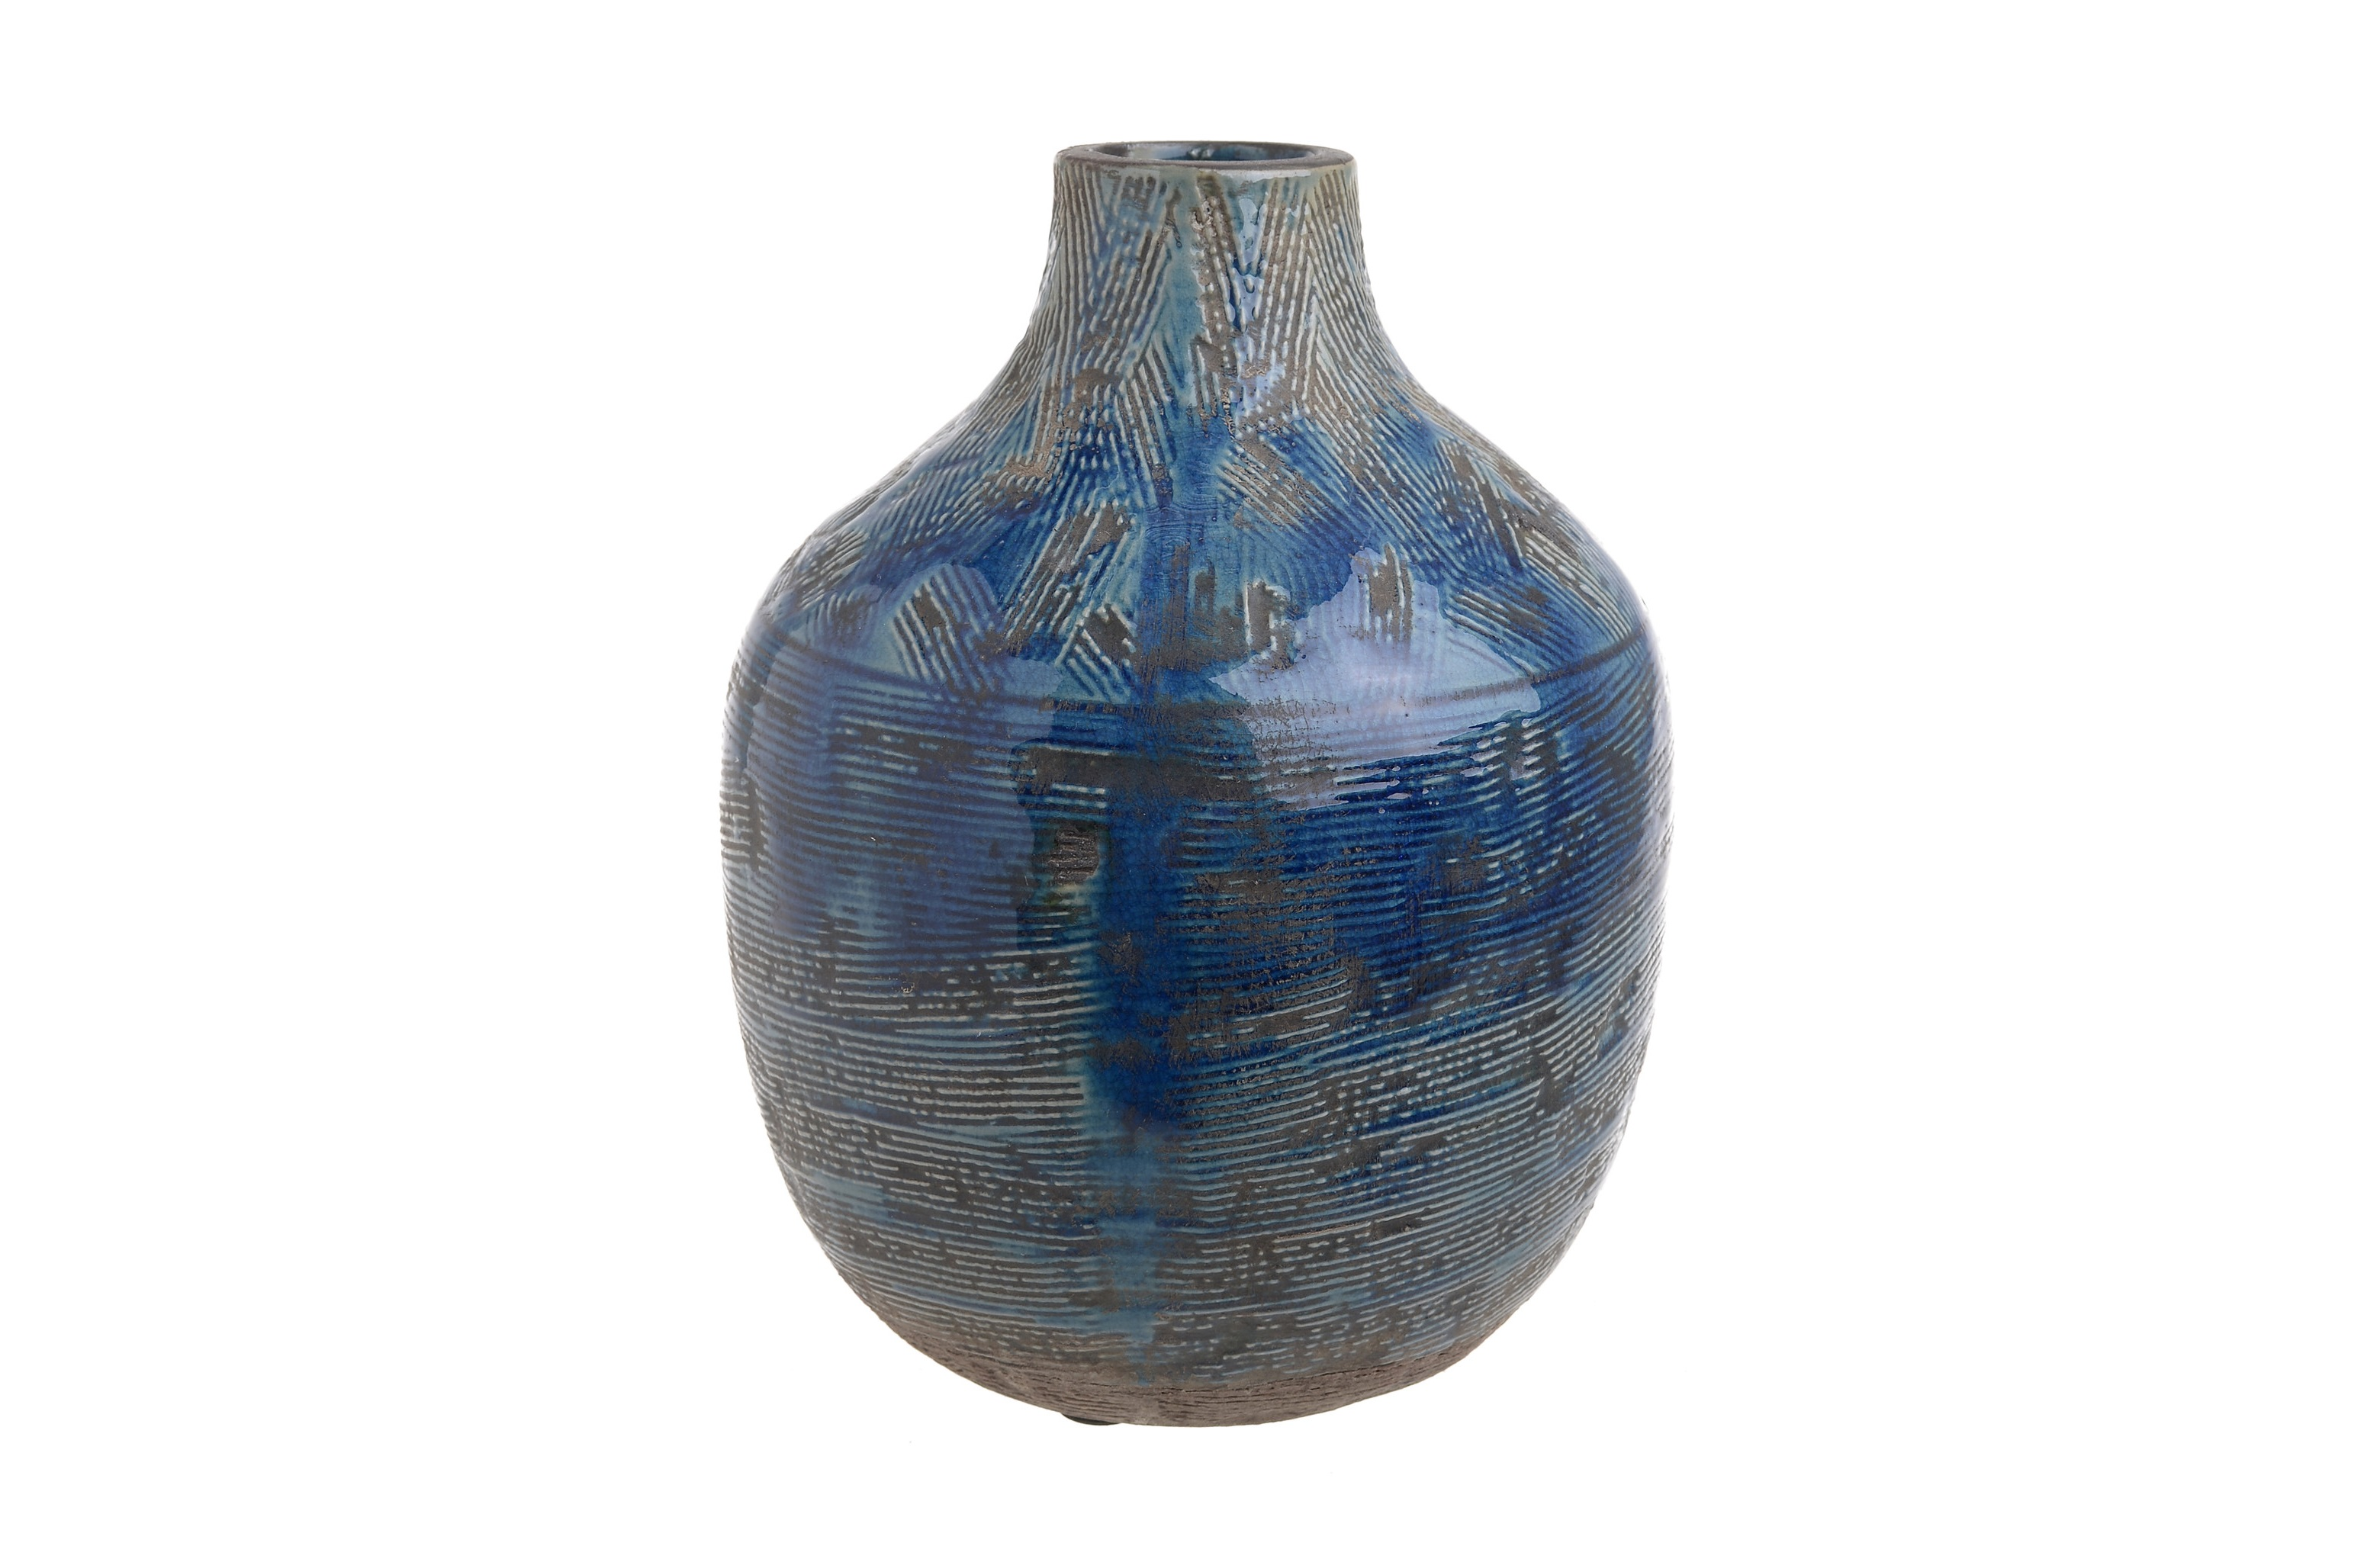 Ваза GlendaВазы<br><br><br>Material: Керамика<br>Ширина см: 16<br>Высота см: 20<br>Глубина см: 16